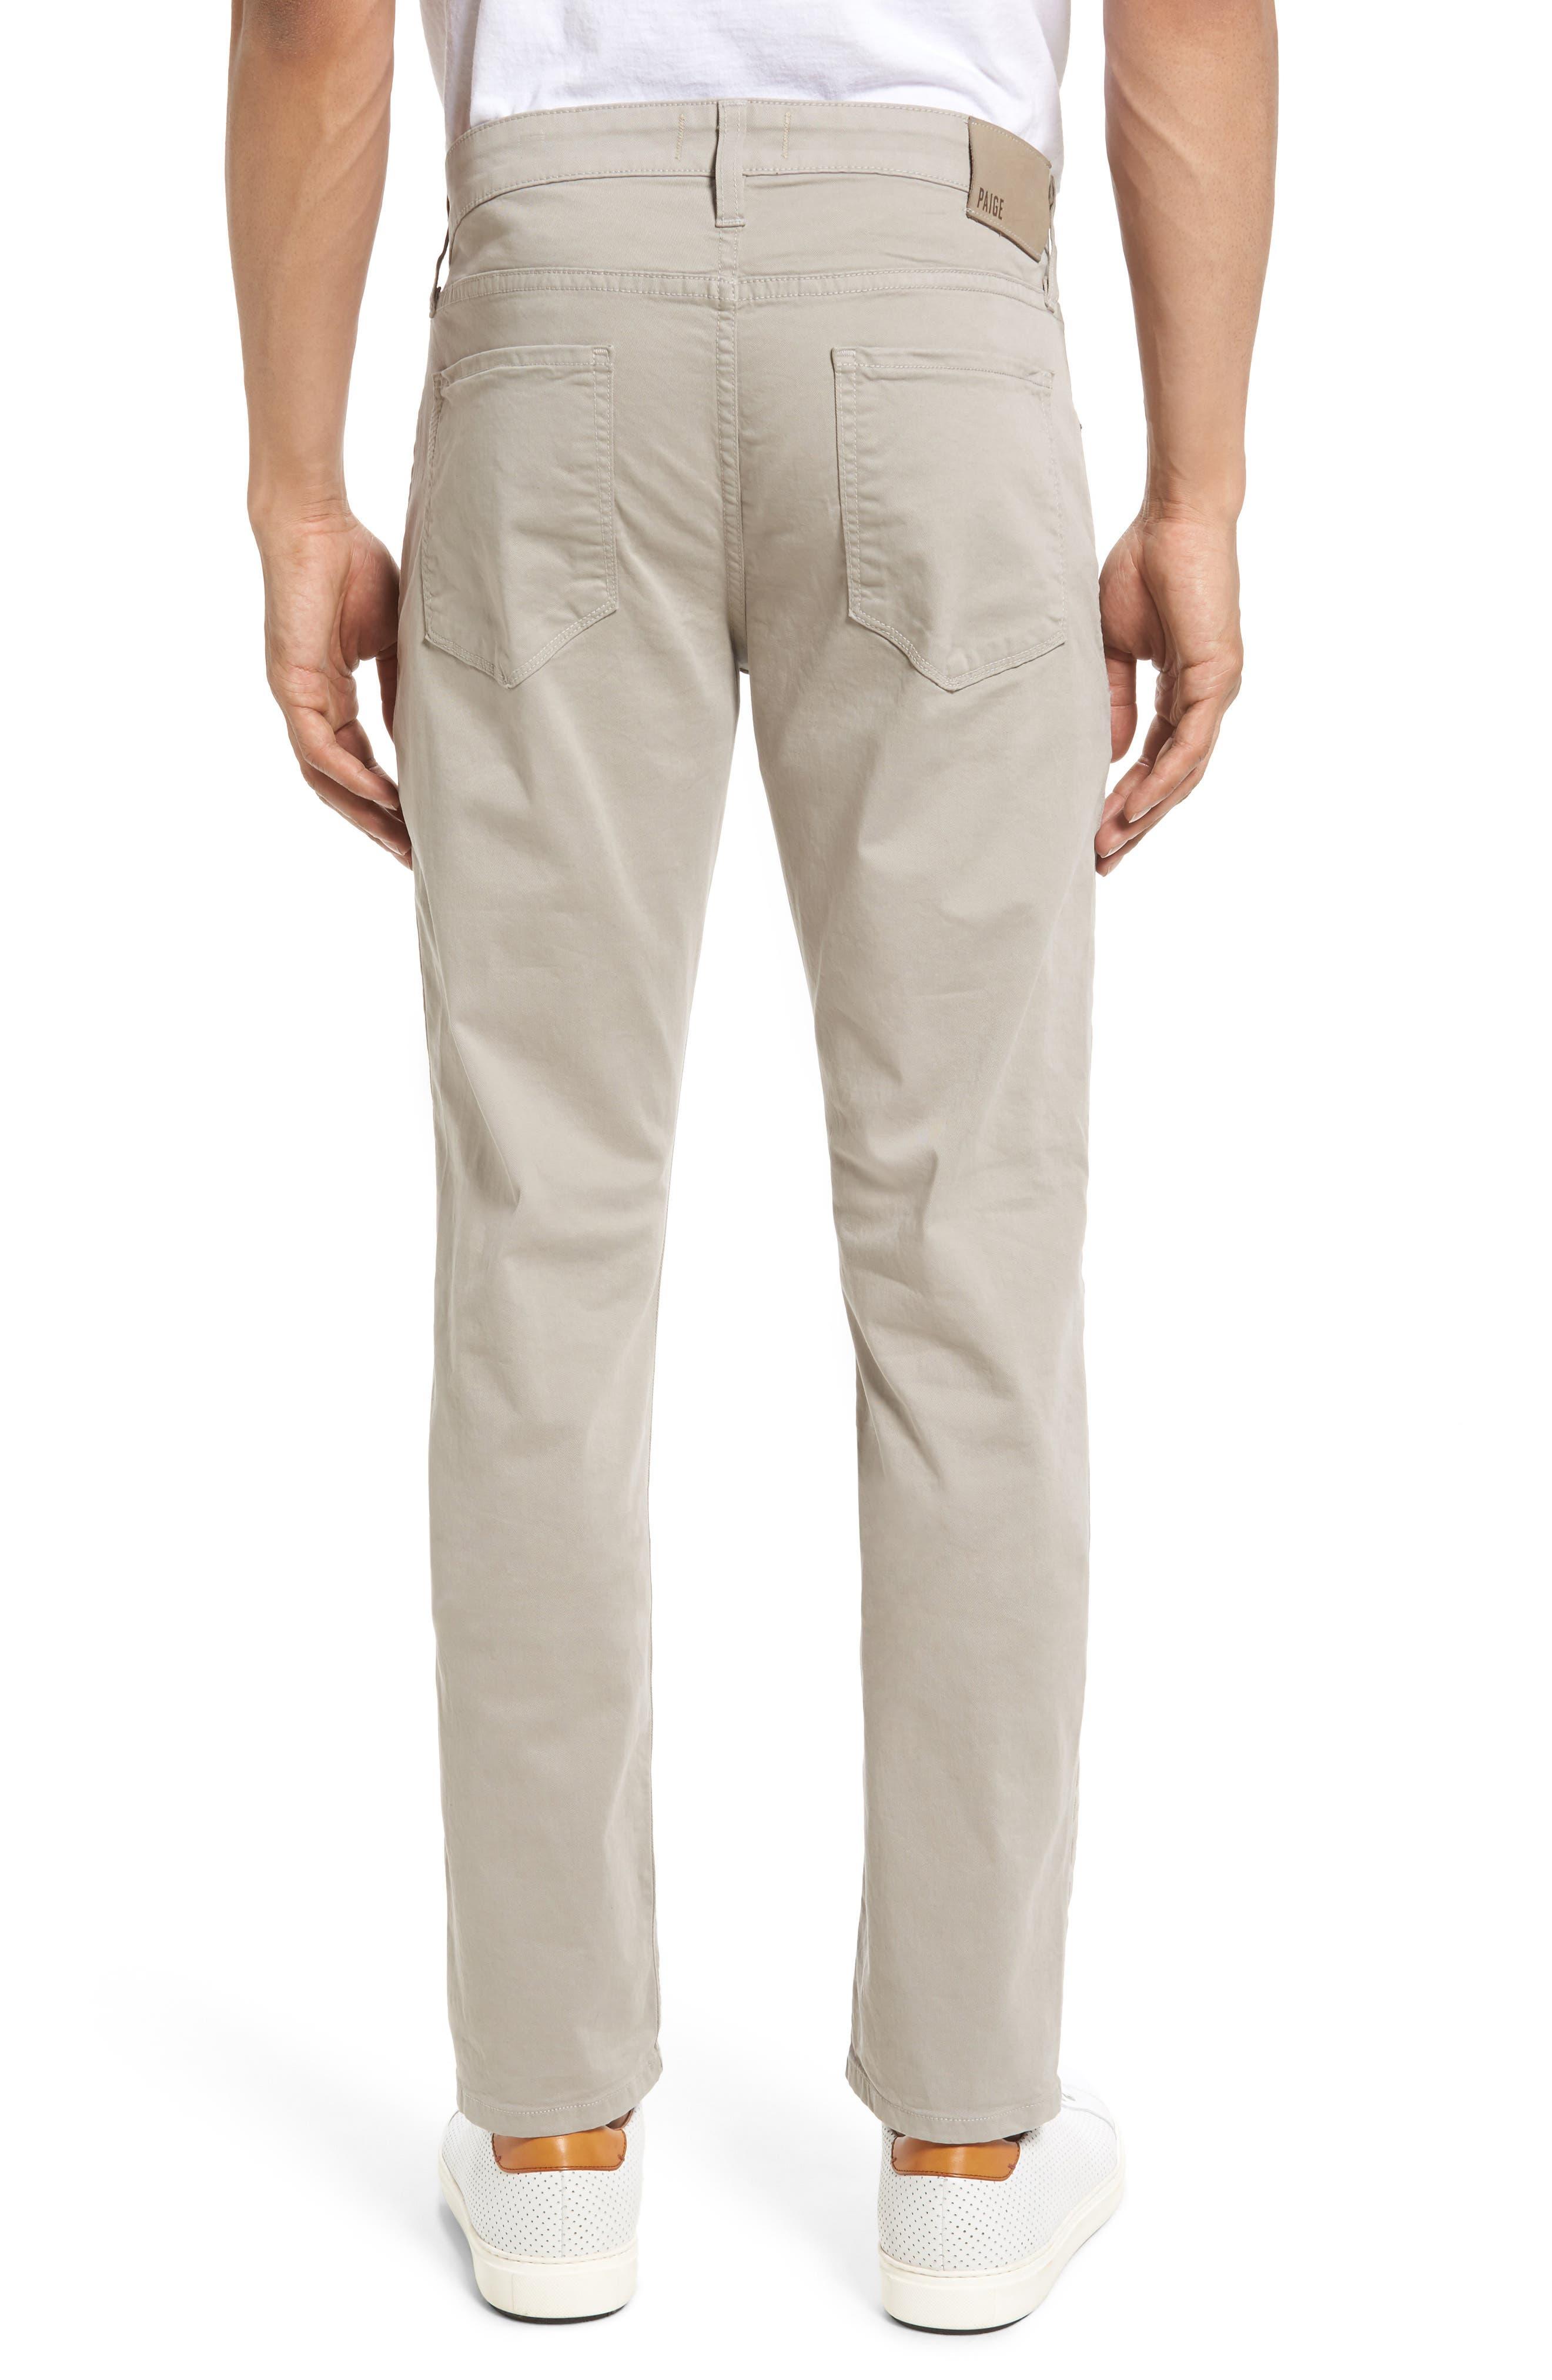 Lennox Skinny Fit Pants,                             Alternate thumbnail 2, color,                             Grey Coast